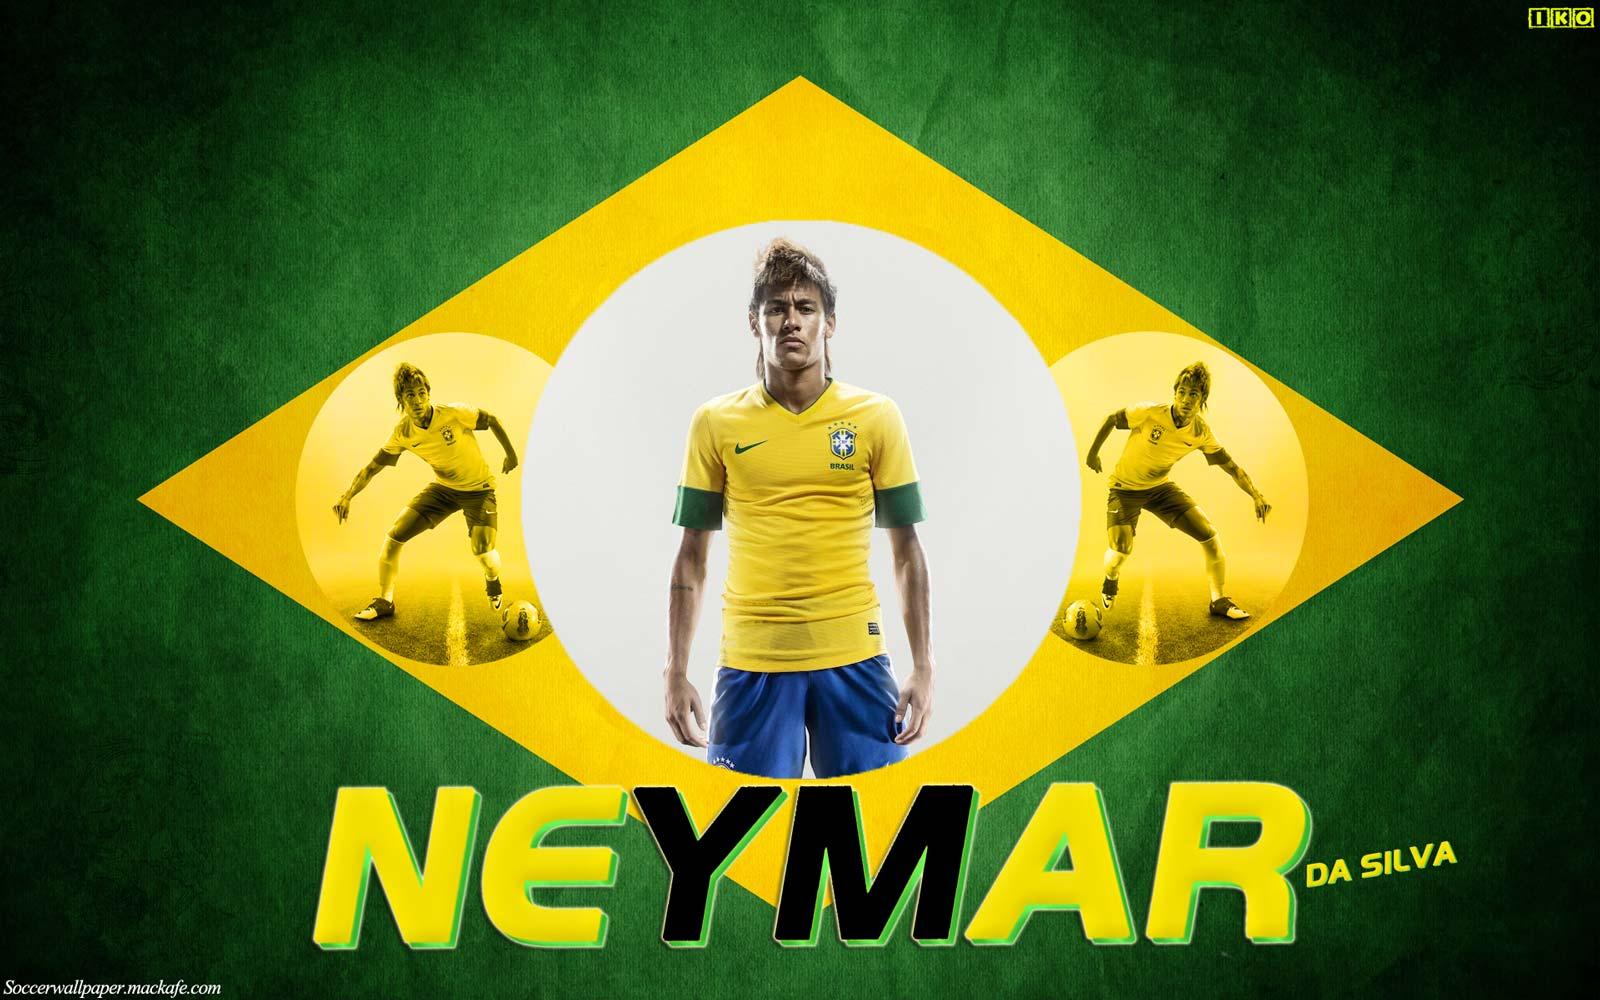 Neymar Wallpaper Brazil ImageBankbiz 1600x1000